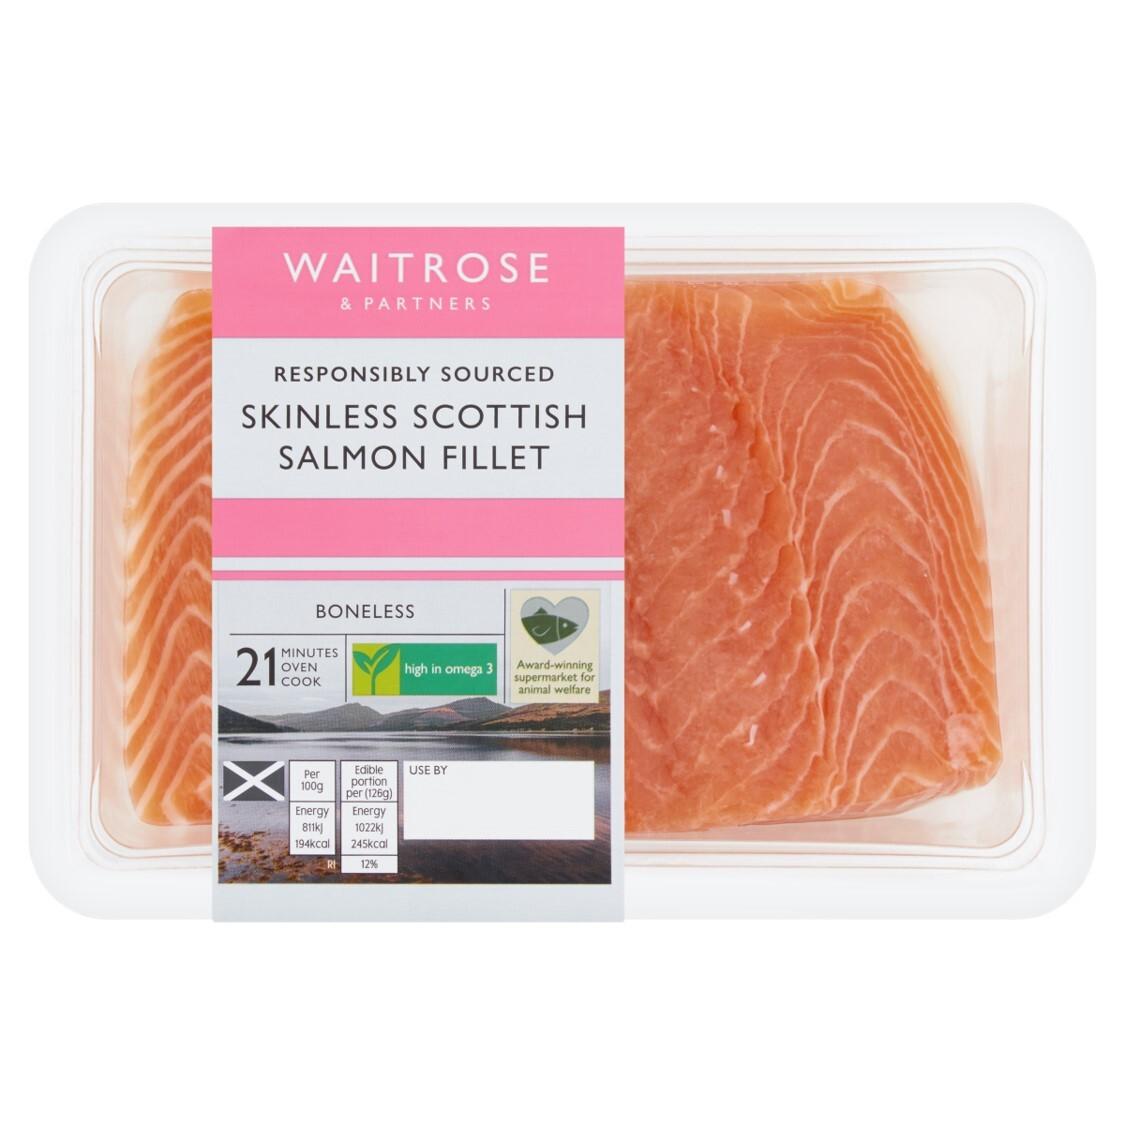 Skinless Salmon Fillet